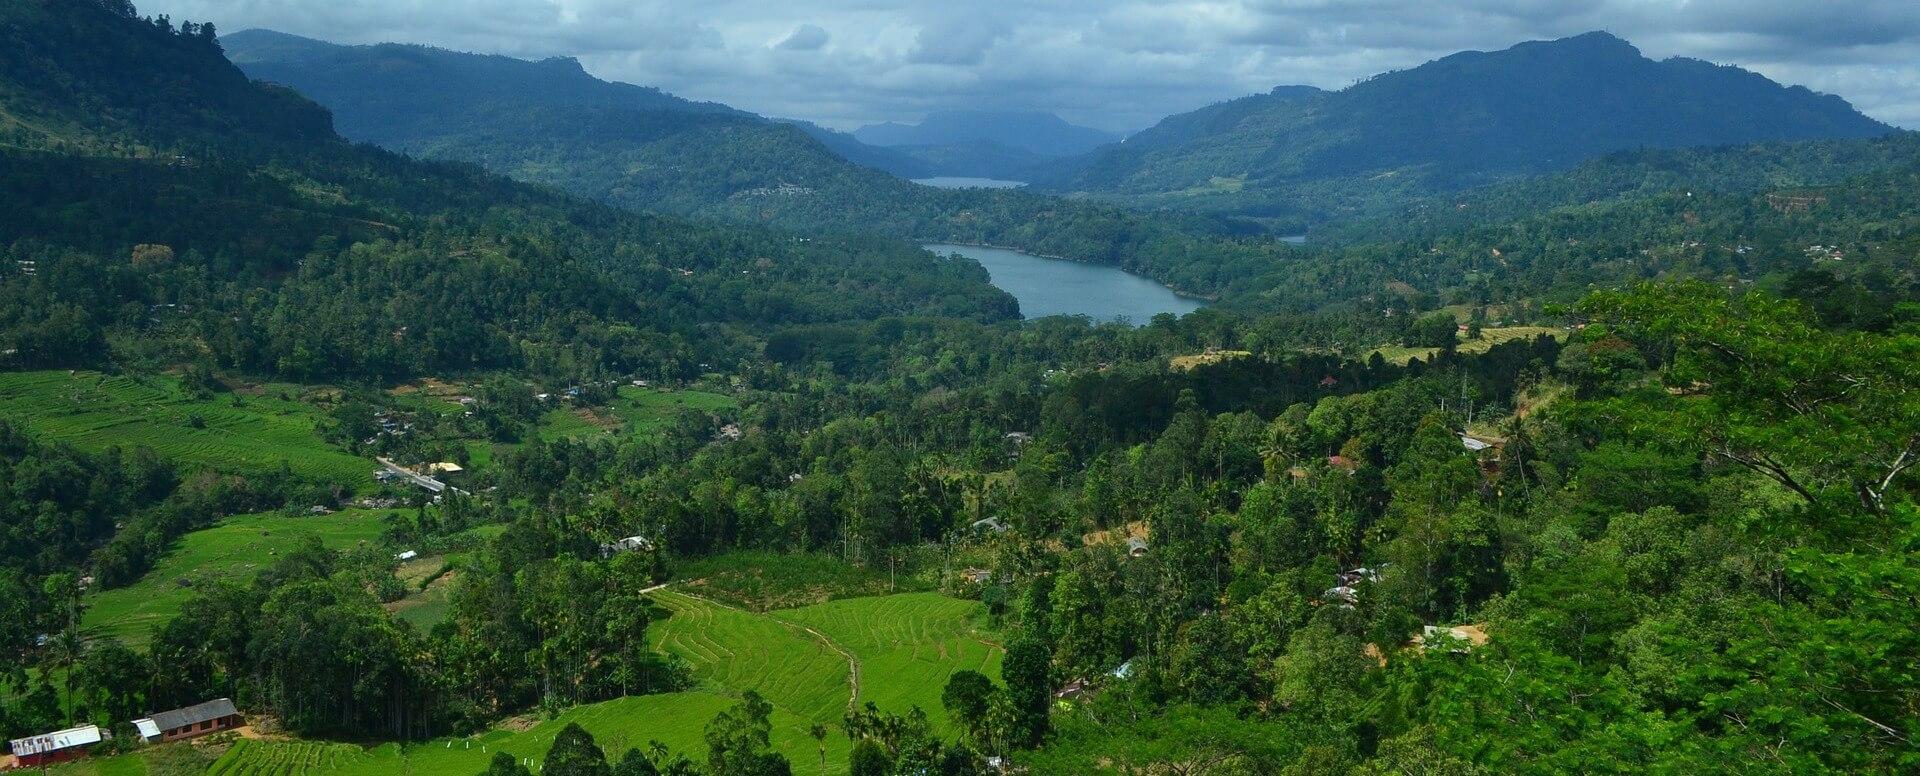 10. Contempler de sublimes décors naturels - Sri Lanka